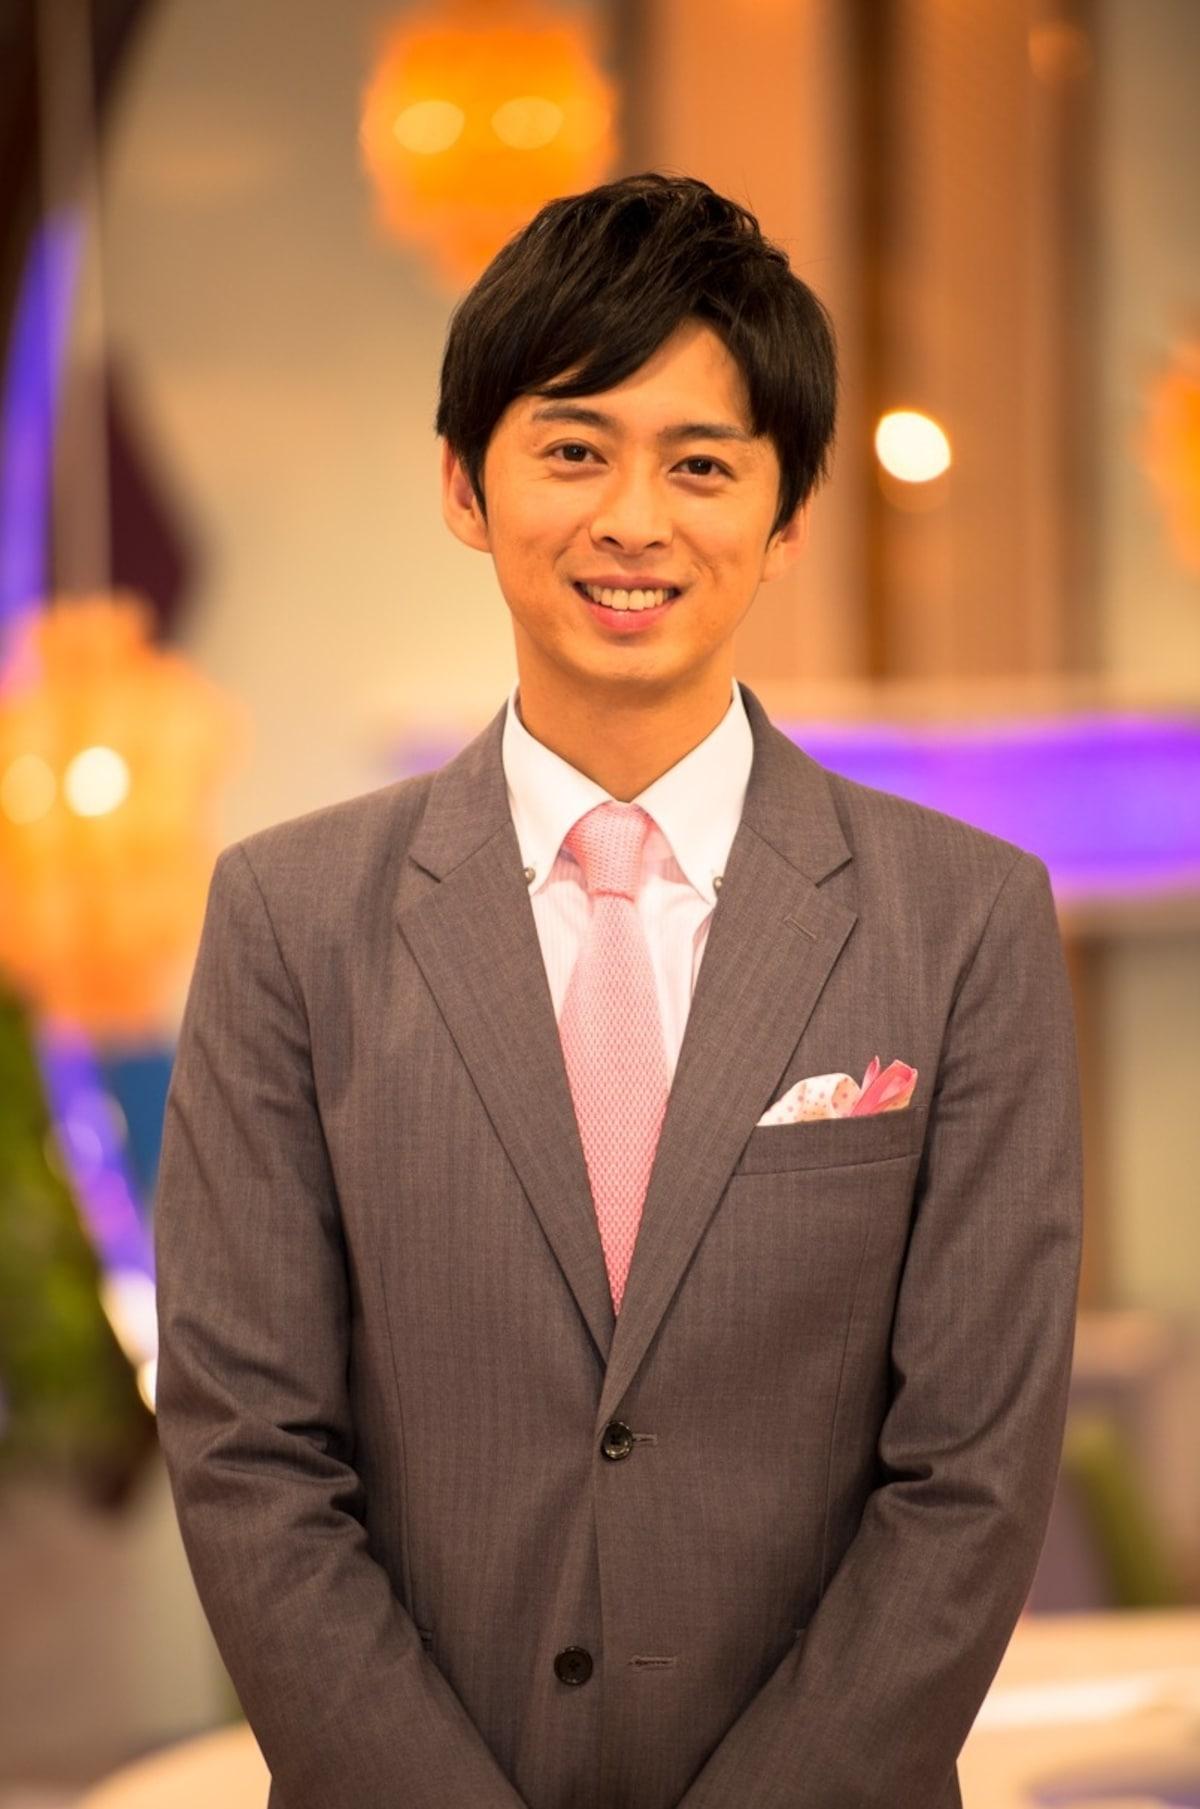 Top5 蓬莱大介  读卖电视台(読売テレビ)